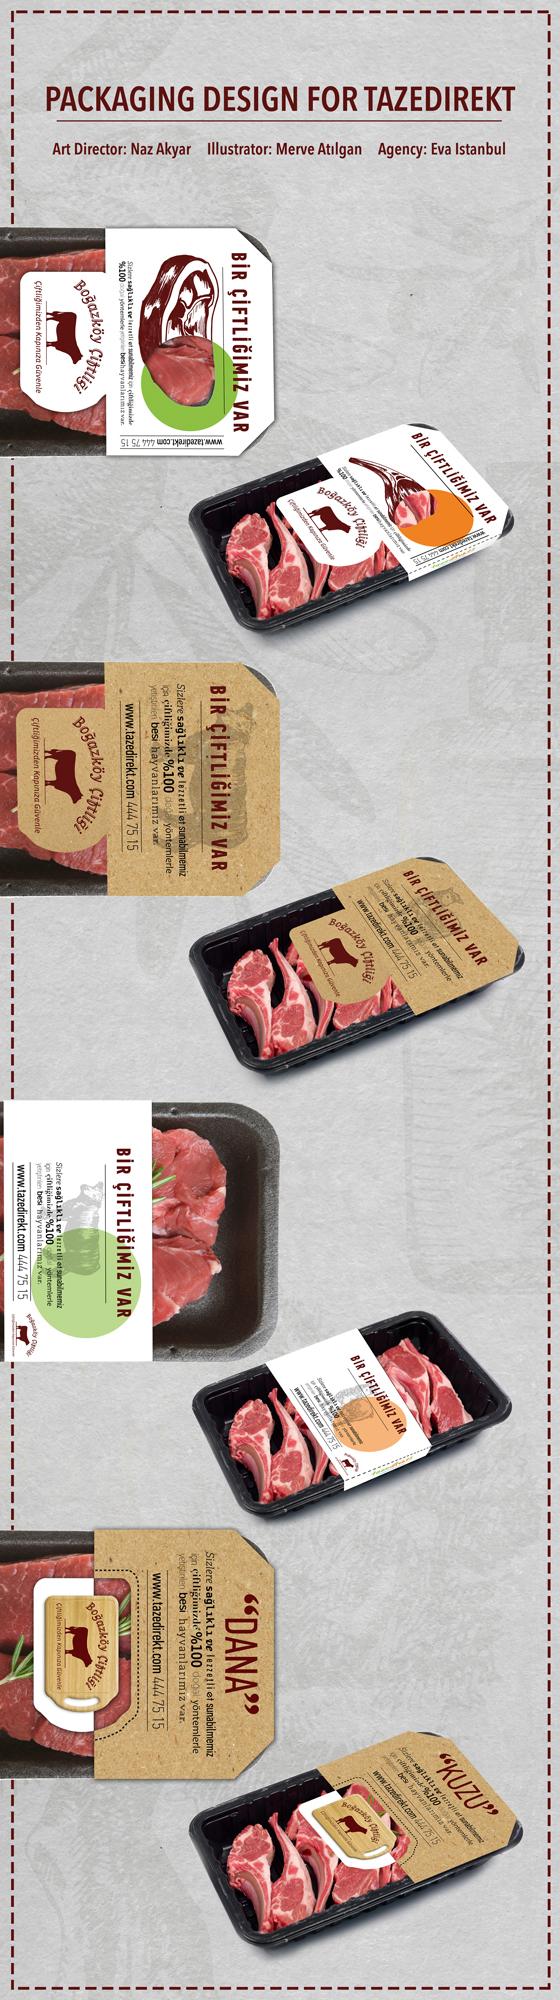 sleeve meat box e-commerce fresh steak lamb market